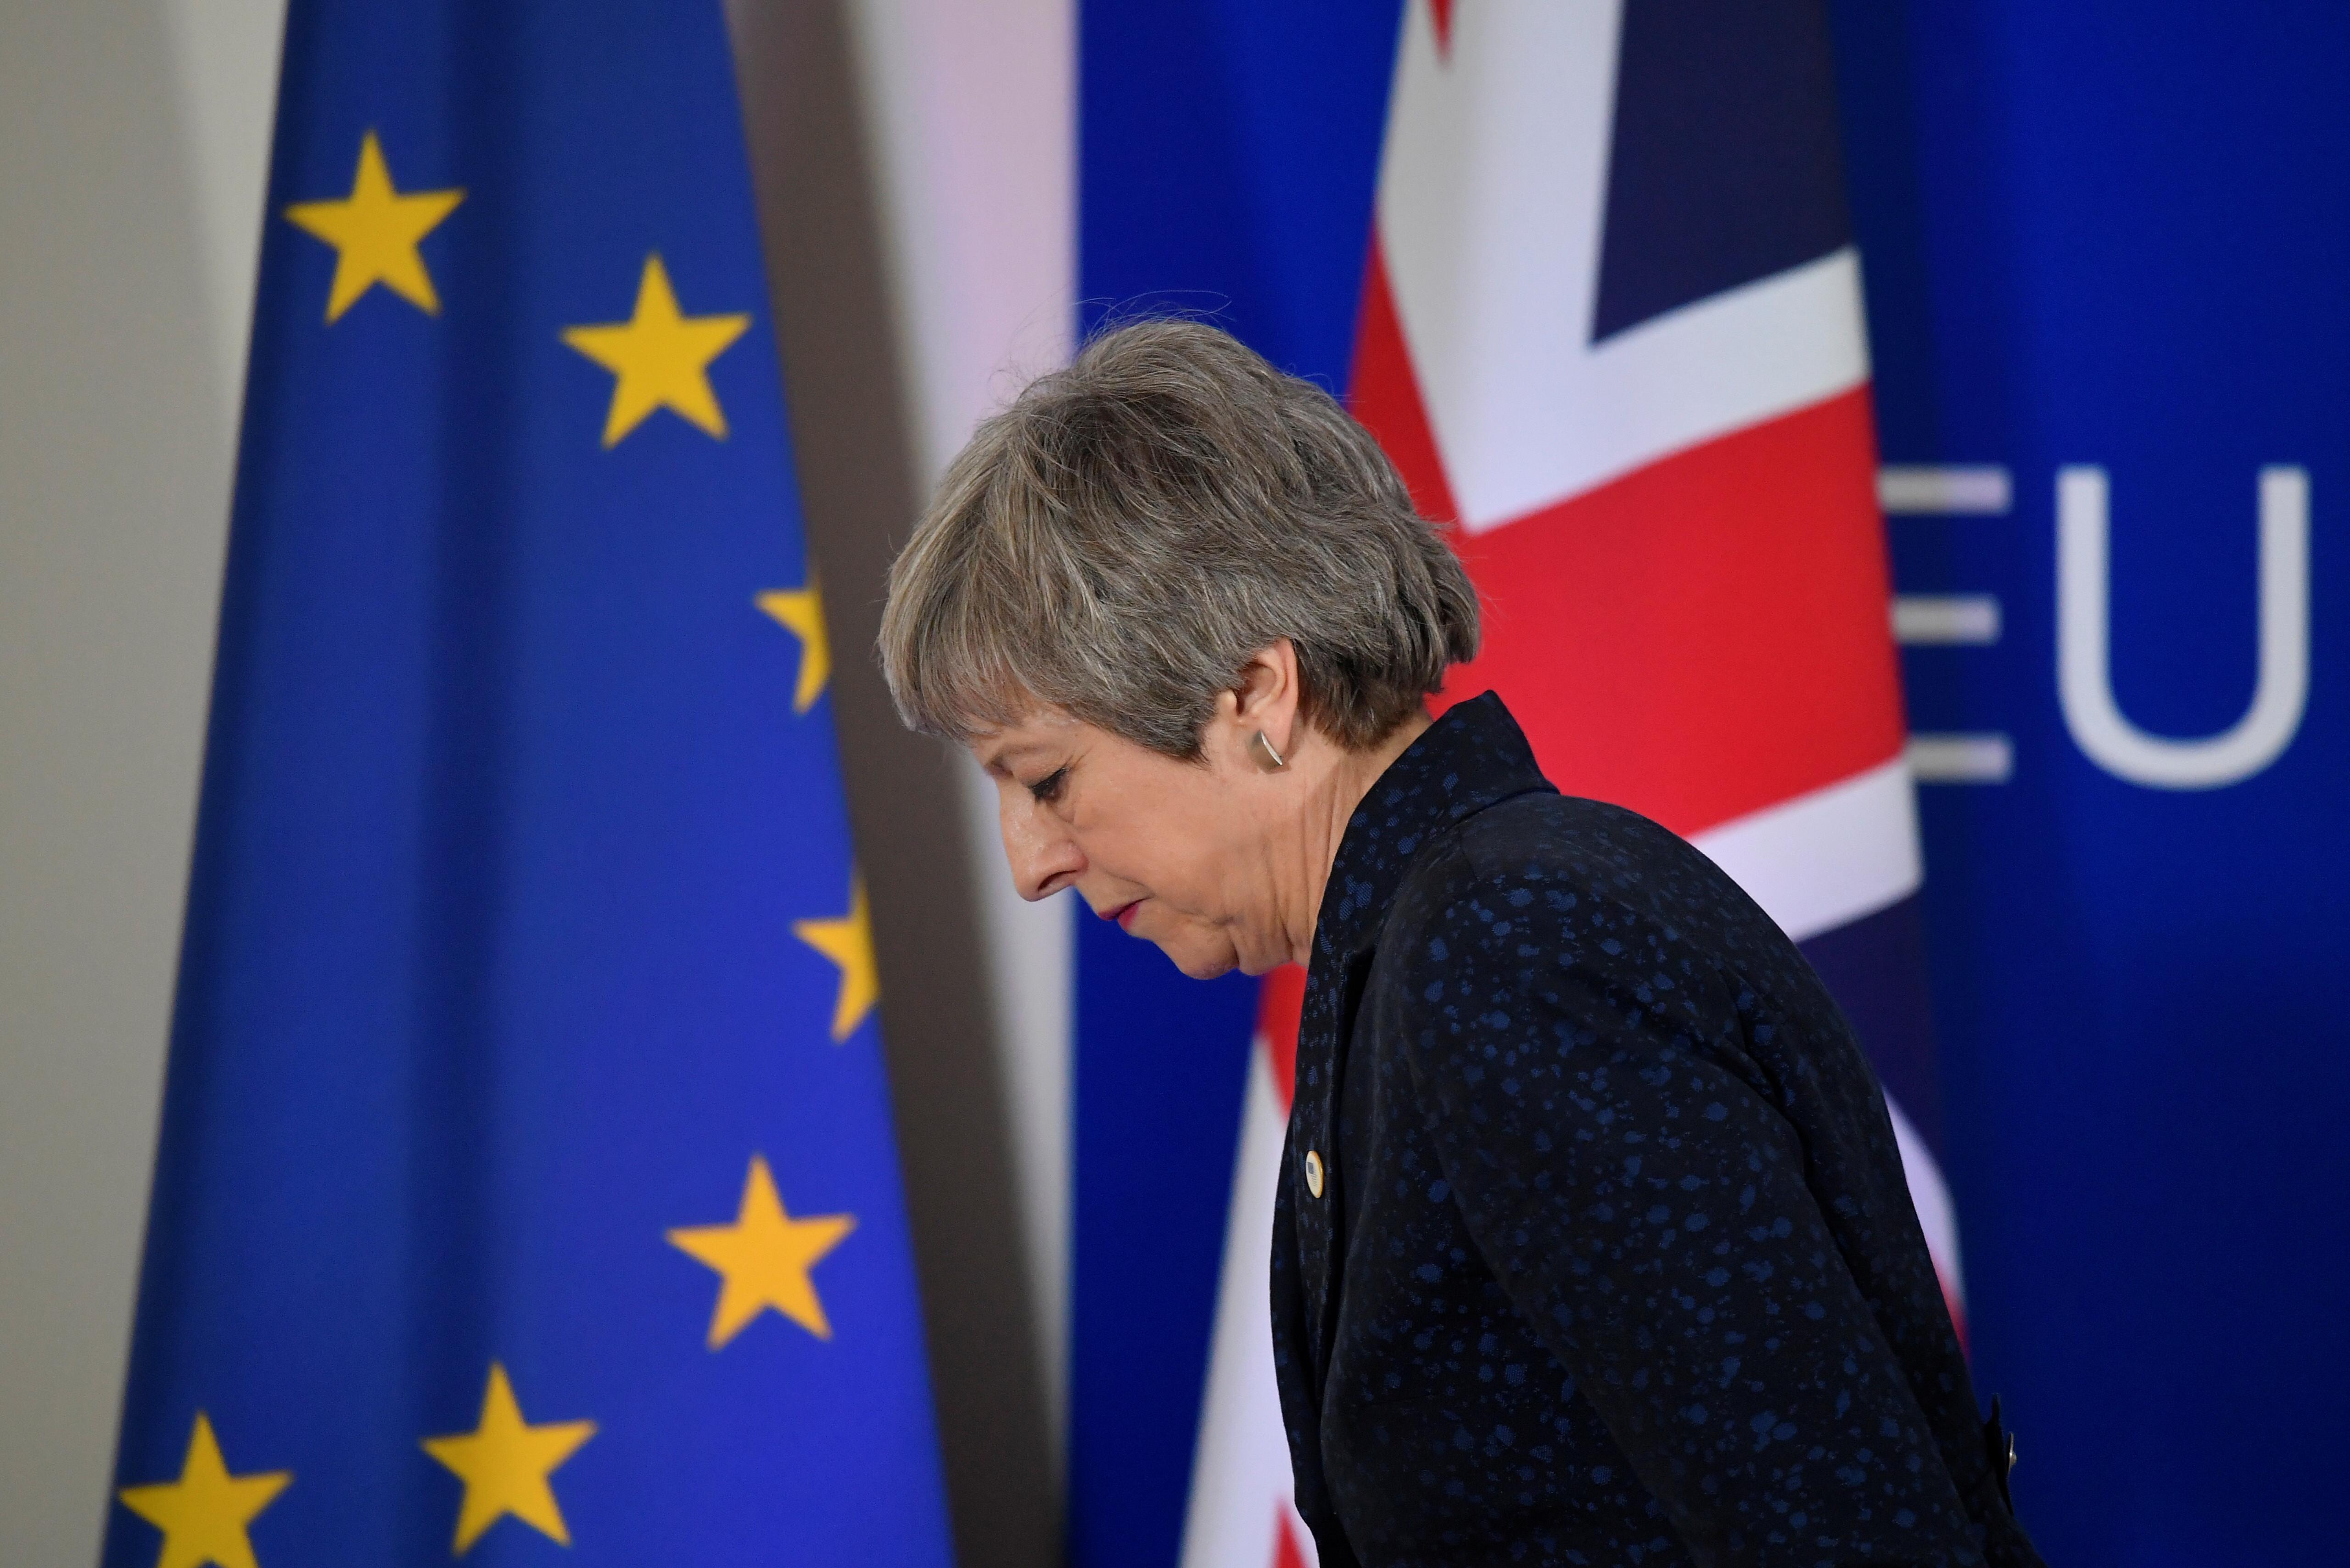 May conclui que continua sem apoio para aprovar acordo de Brexit